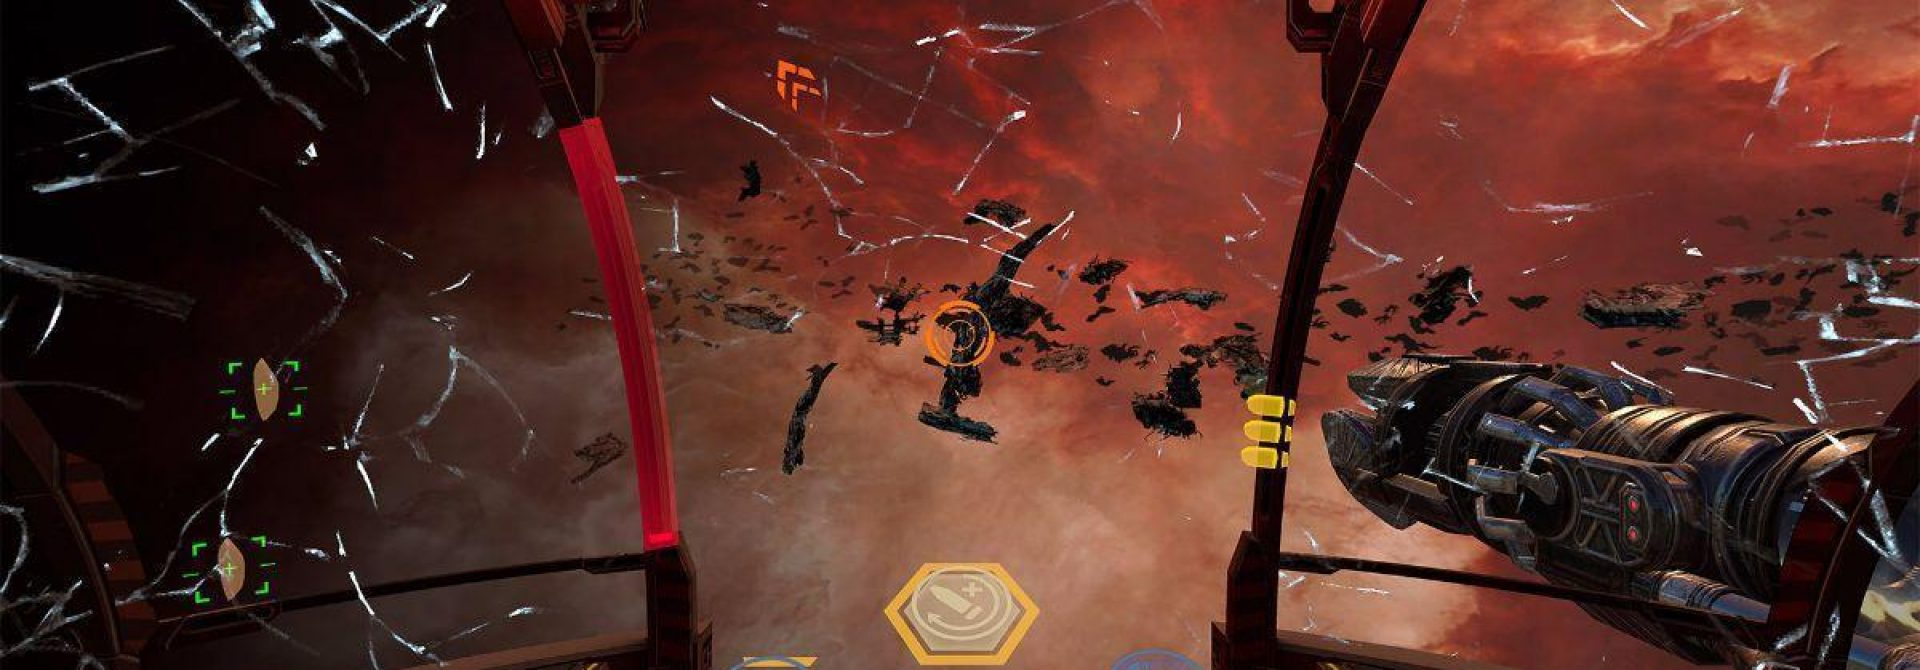 Gunjack 2: End of Shift Announced